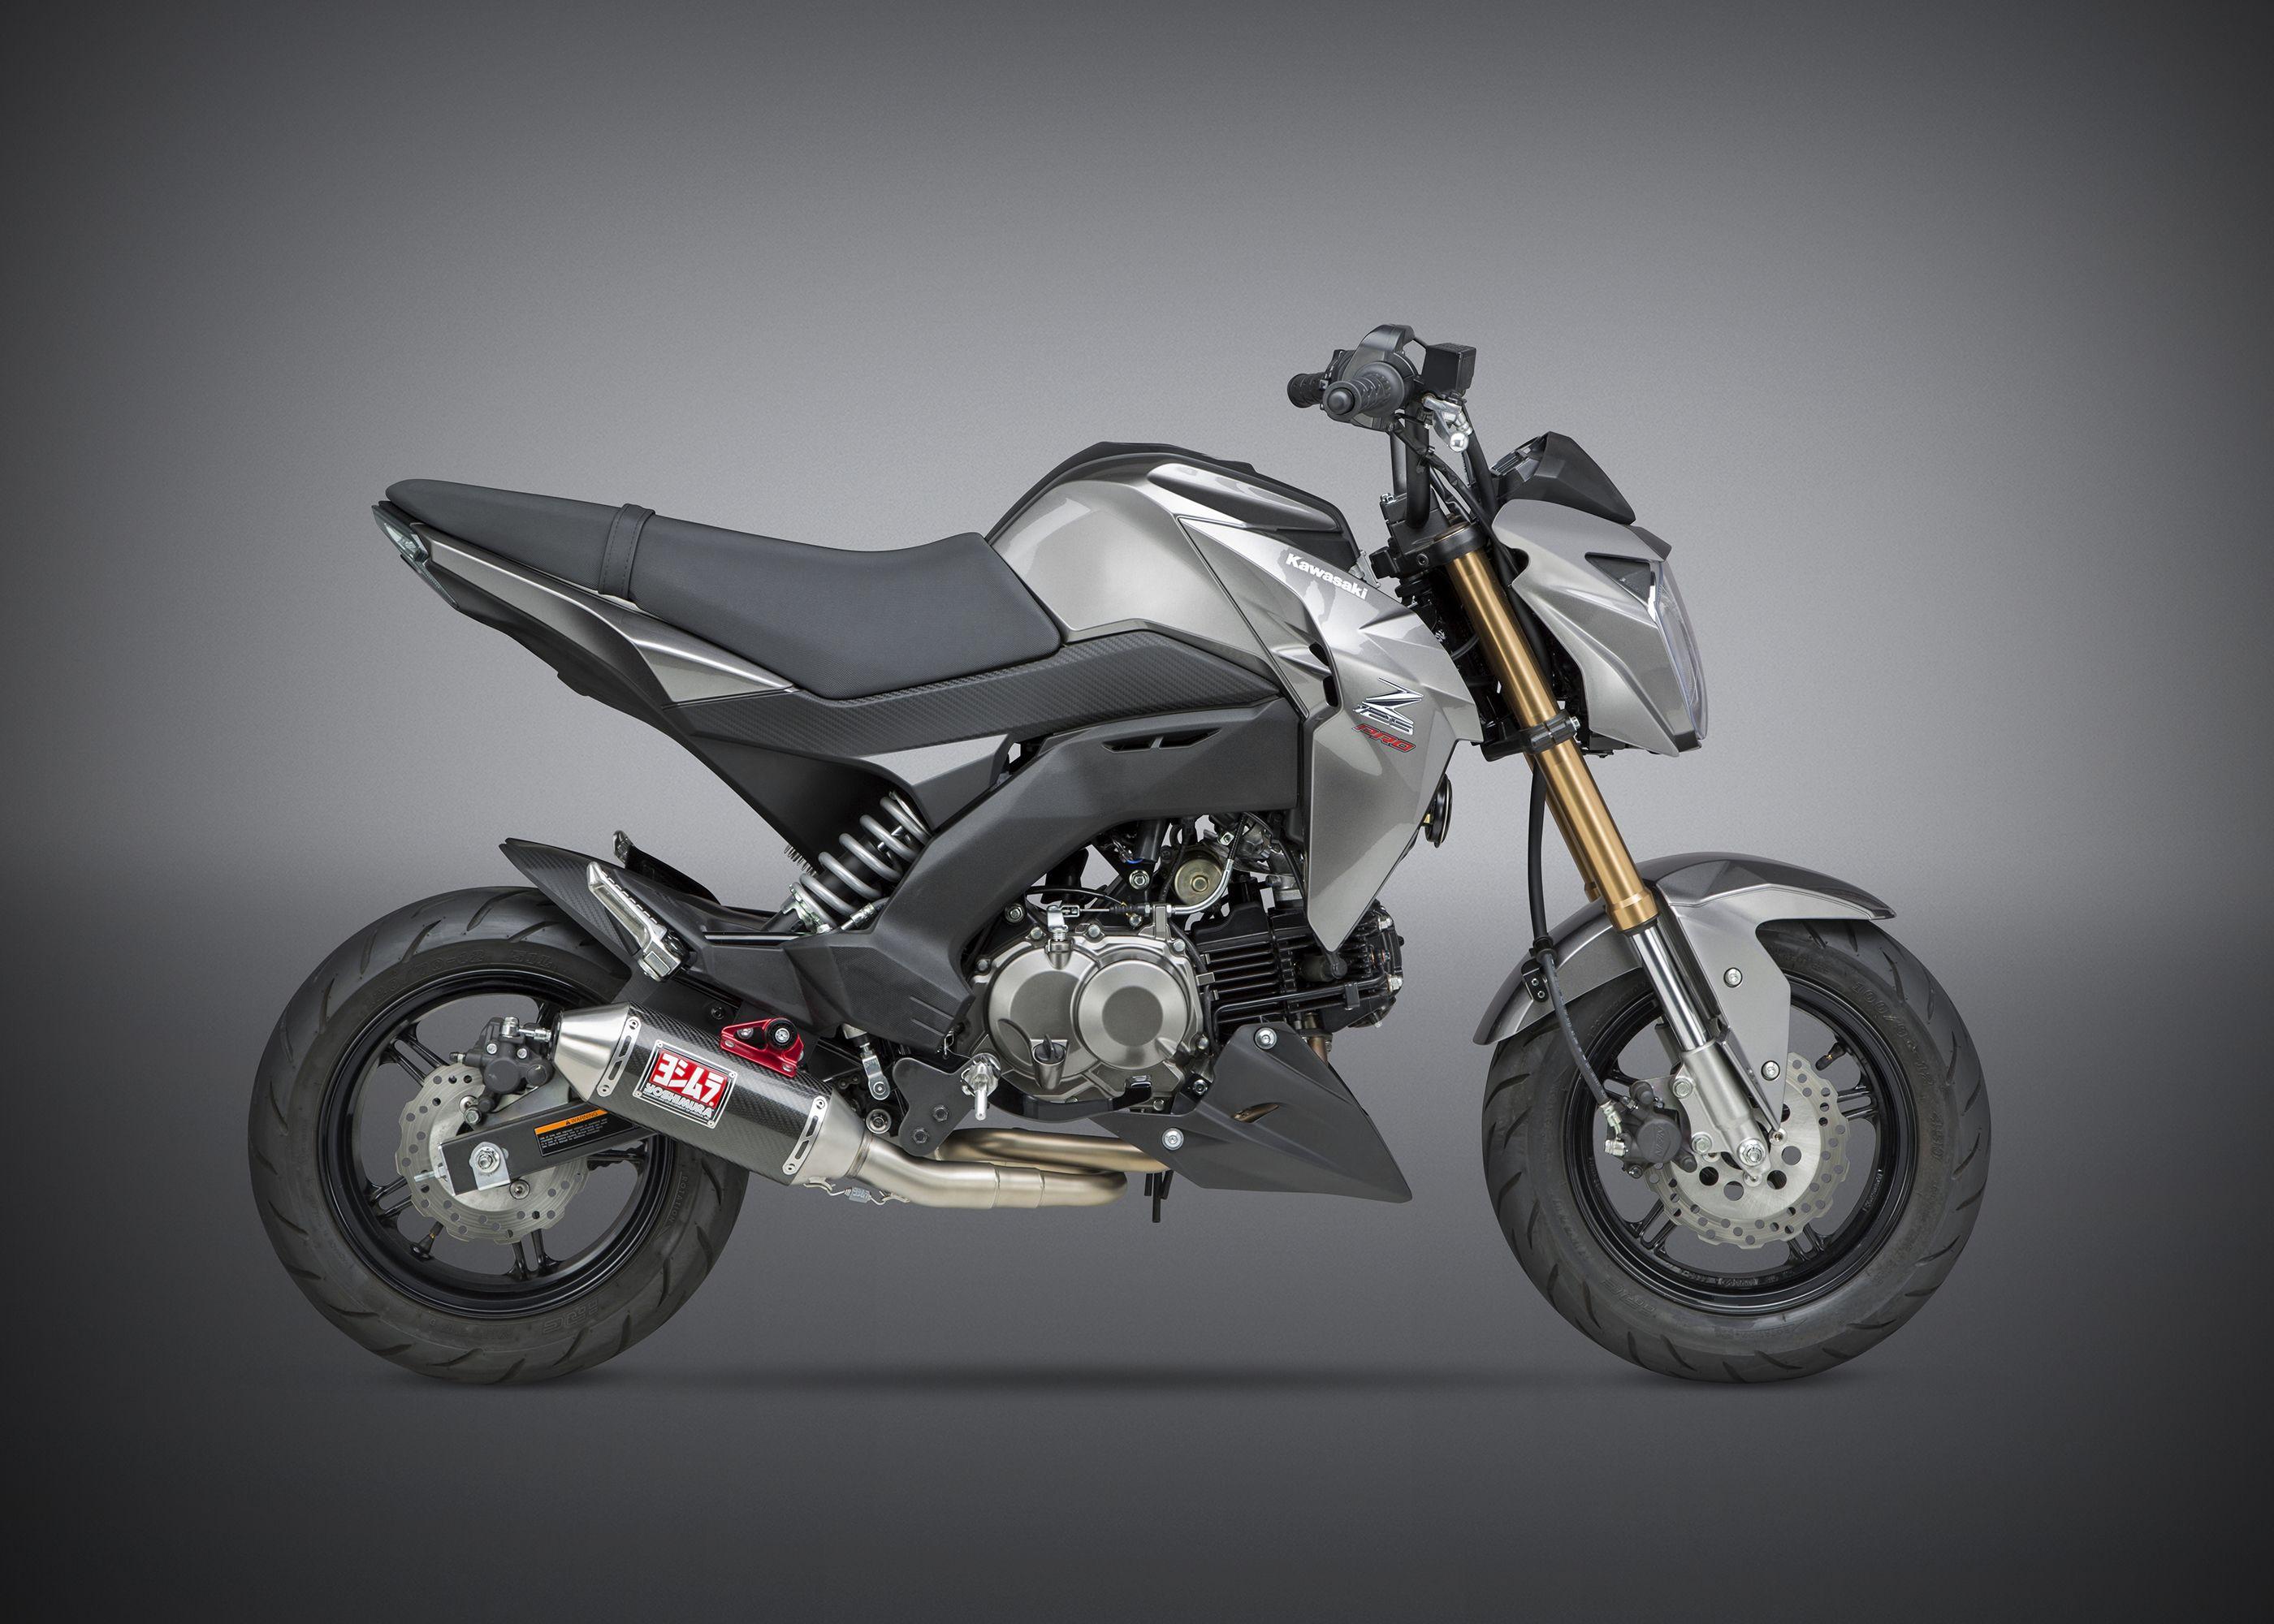 Yoshimura Releases 2017 Kawasaki Z125 Pro Applications Motorcycle